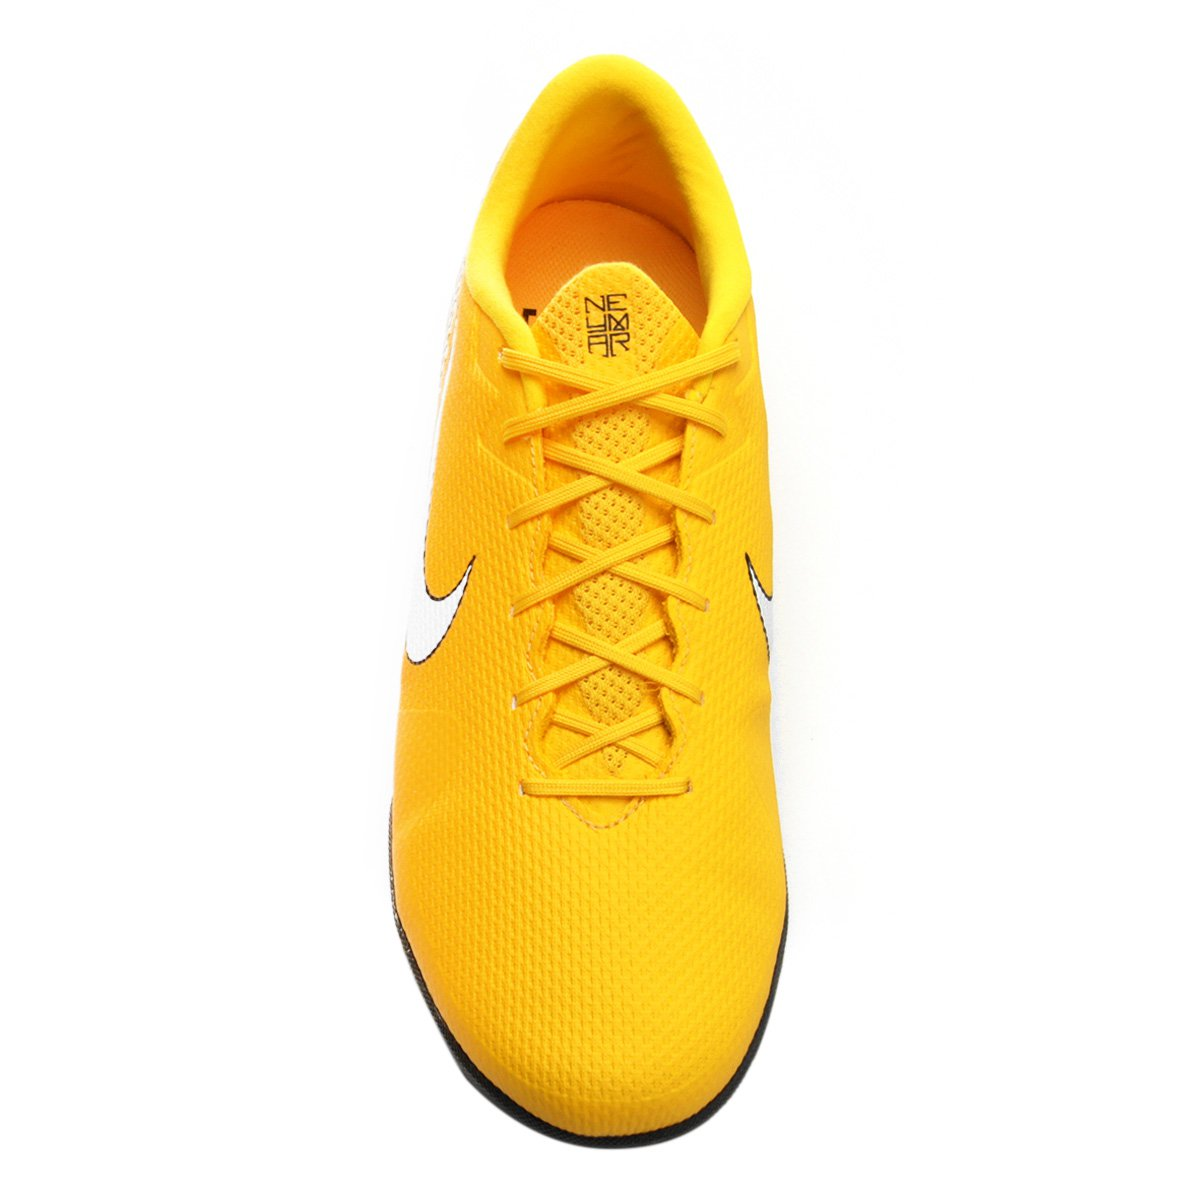 Chuteira Society Nike Mercurial Vapor 12 Academy Neymar TF - Amarelo ... f731774d21bf5